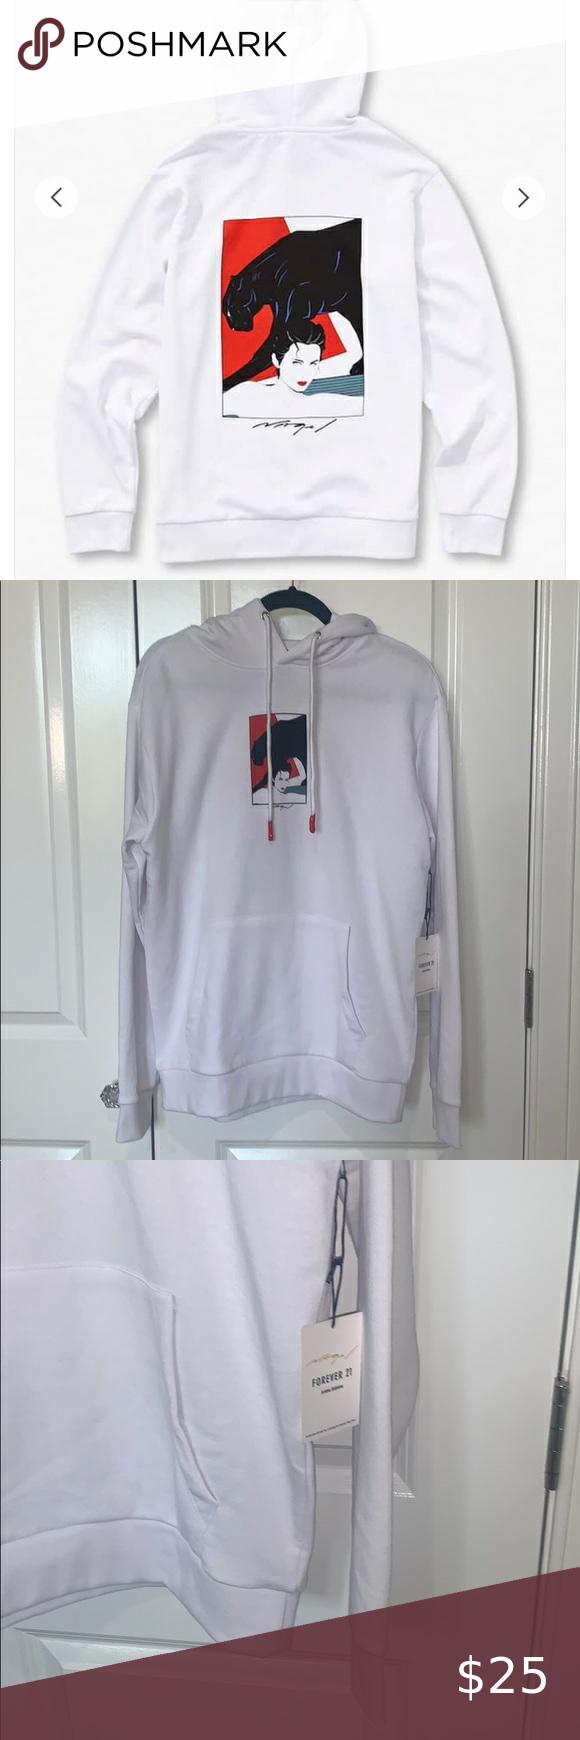 Patrick Nagel X Forever 21 Hoodie Sweatshirt Shirt Hoodies Forever 21 Shirts [ 1740 x 580 Pixel ]